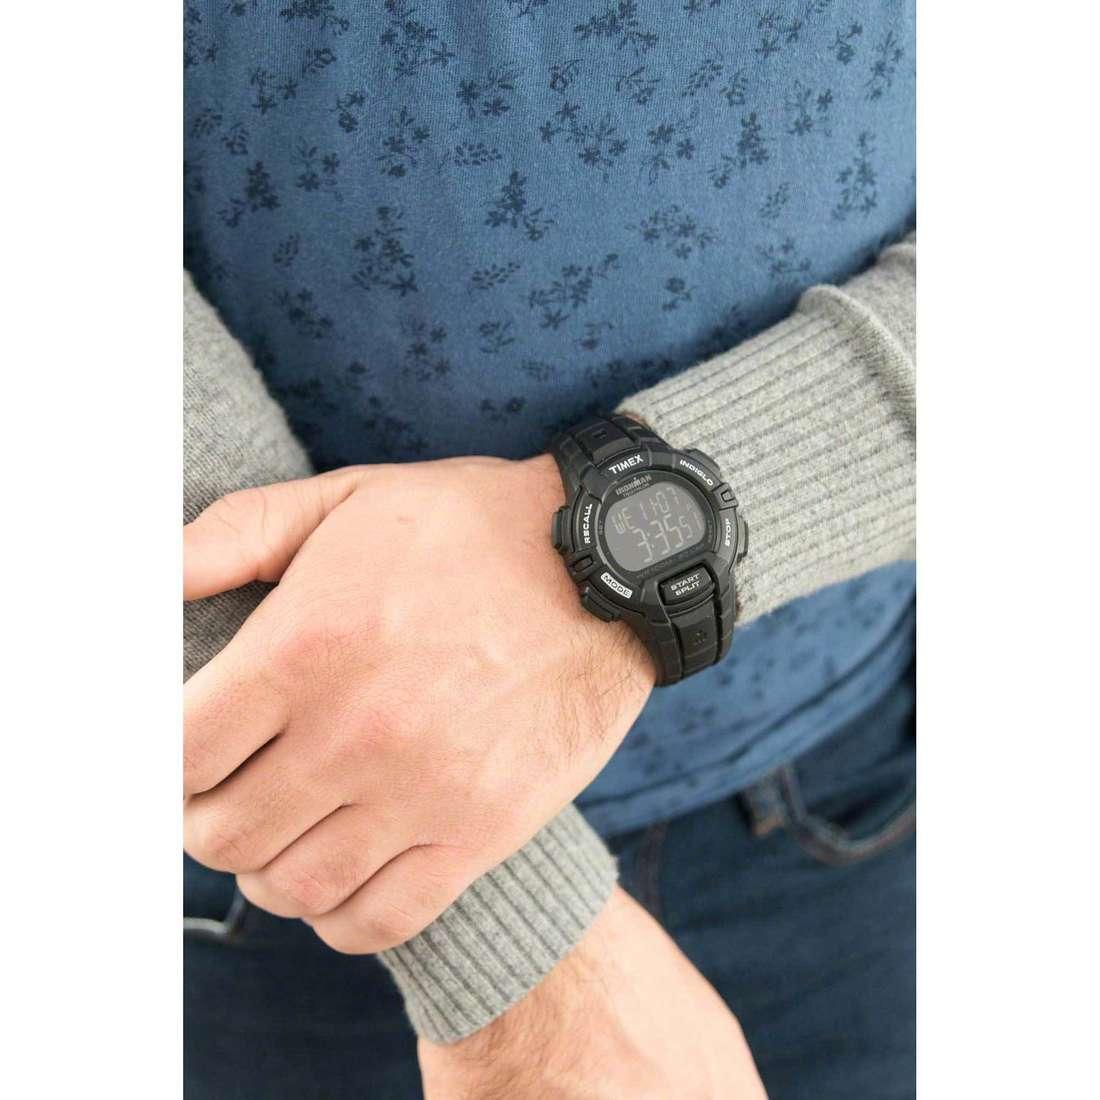 Timex digitali 30 Lap Rugged uomo T5K793 indosso